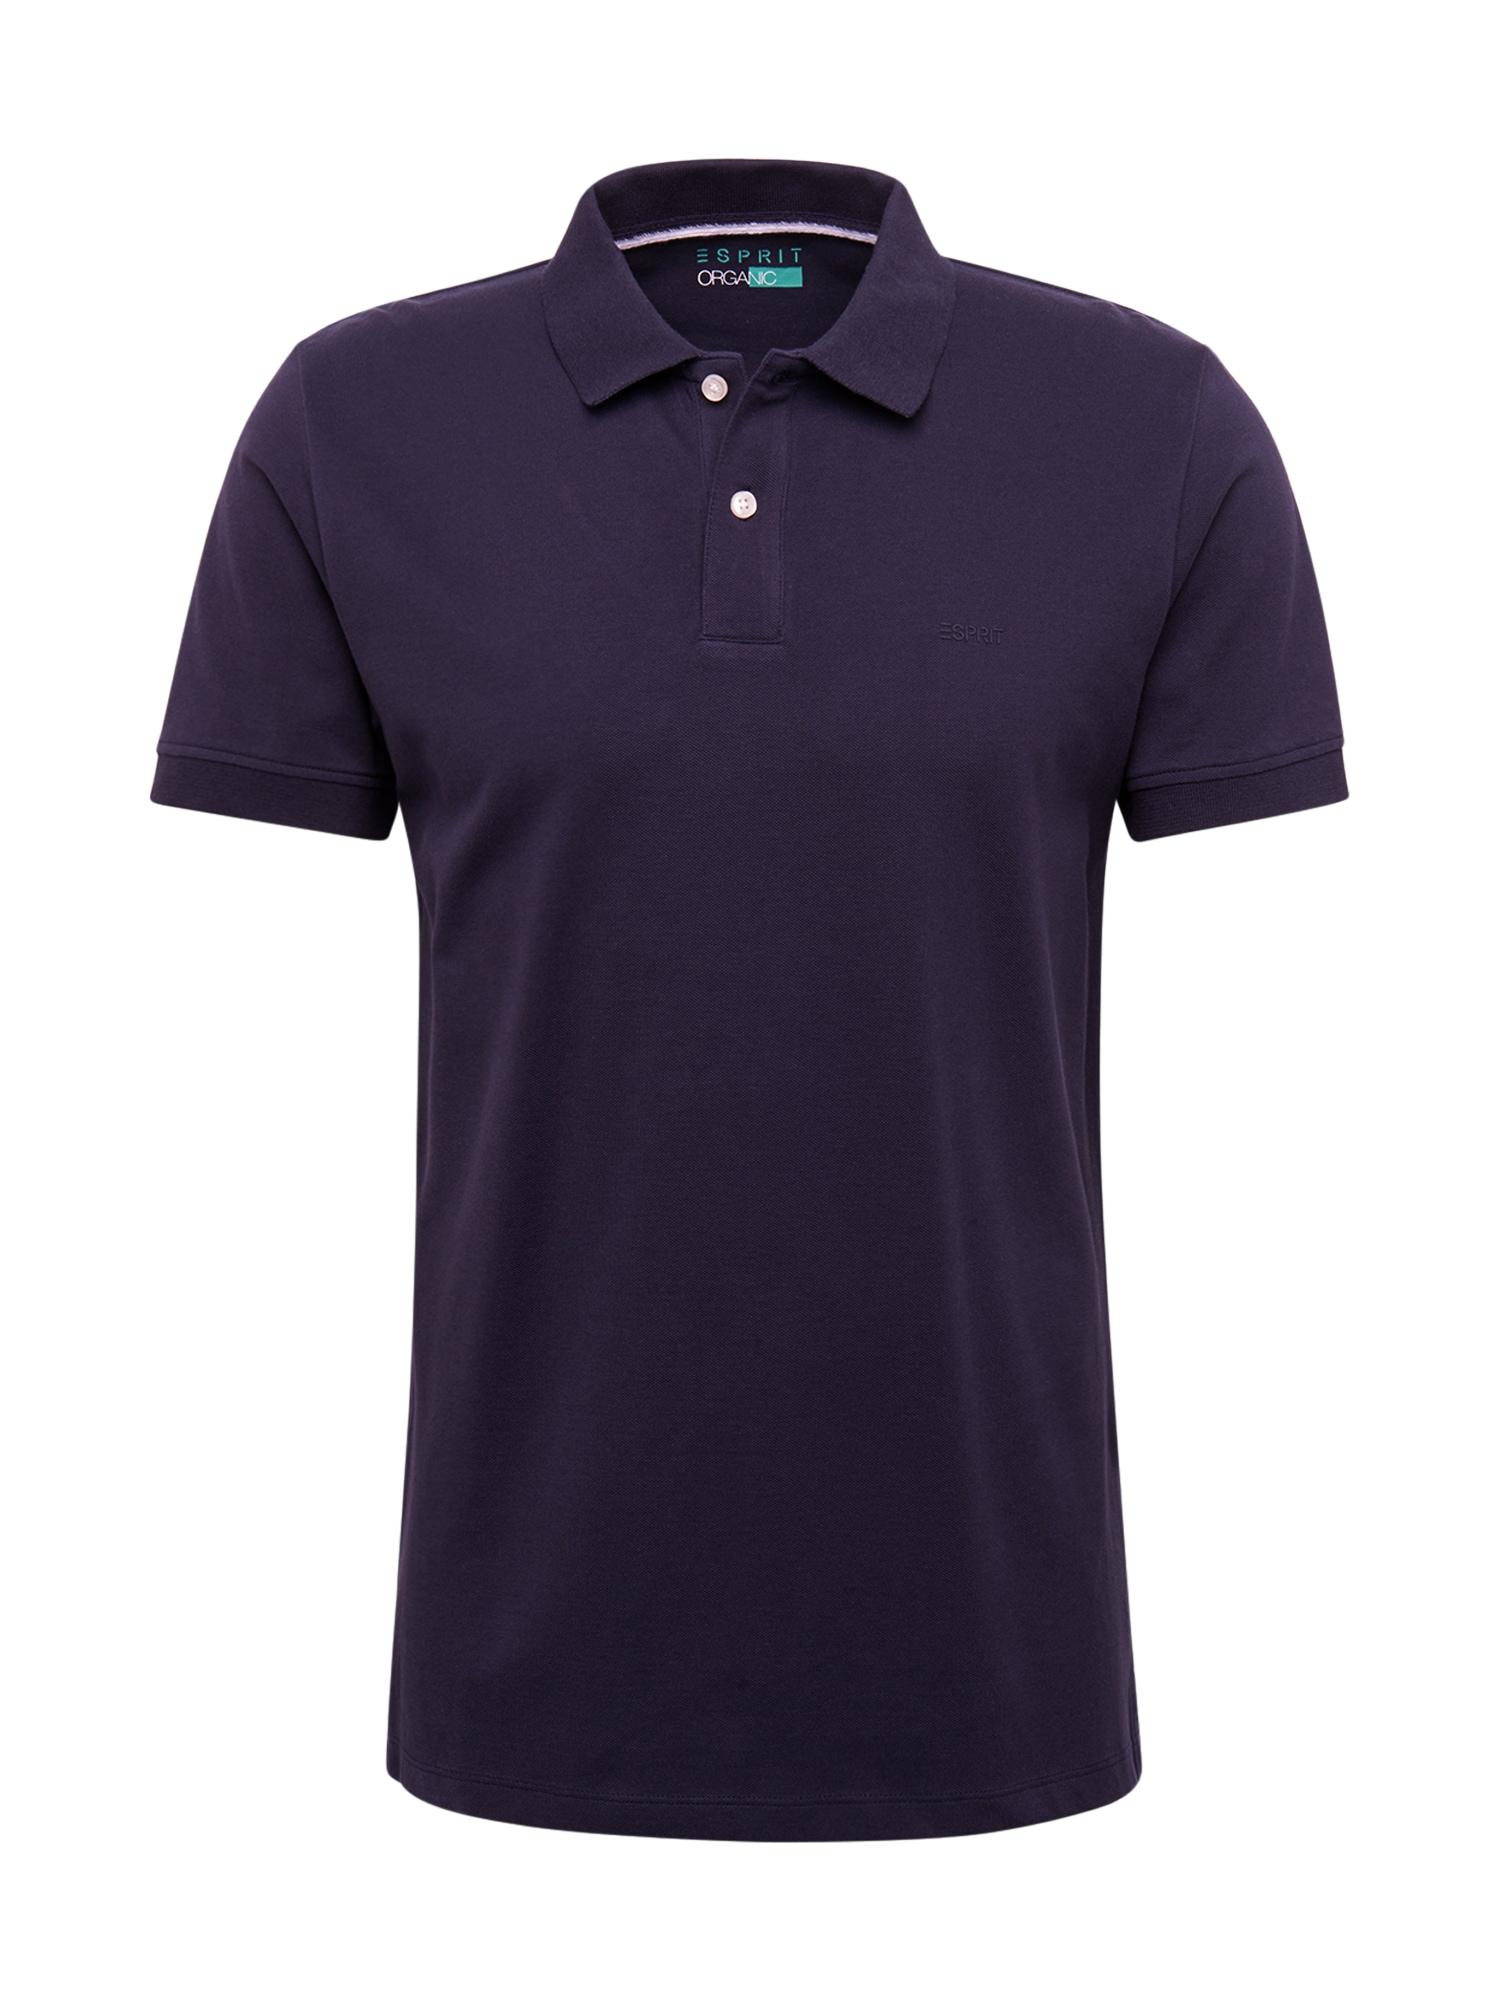 ESPRIT Marškinėliai 'OCS N pi po ss' tamsiai mėlyna